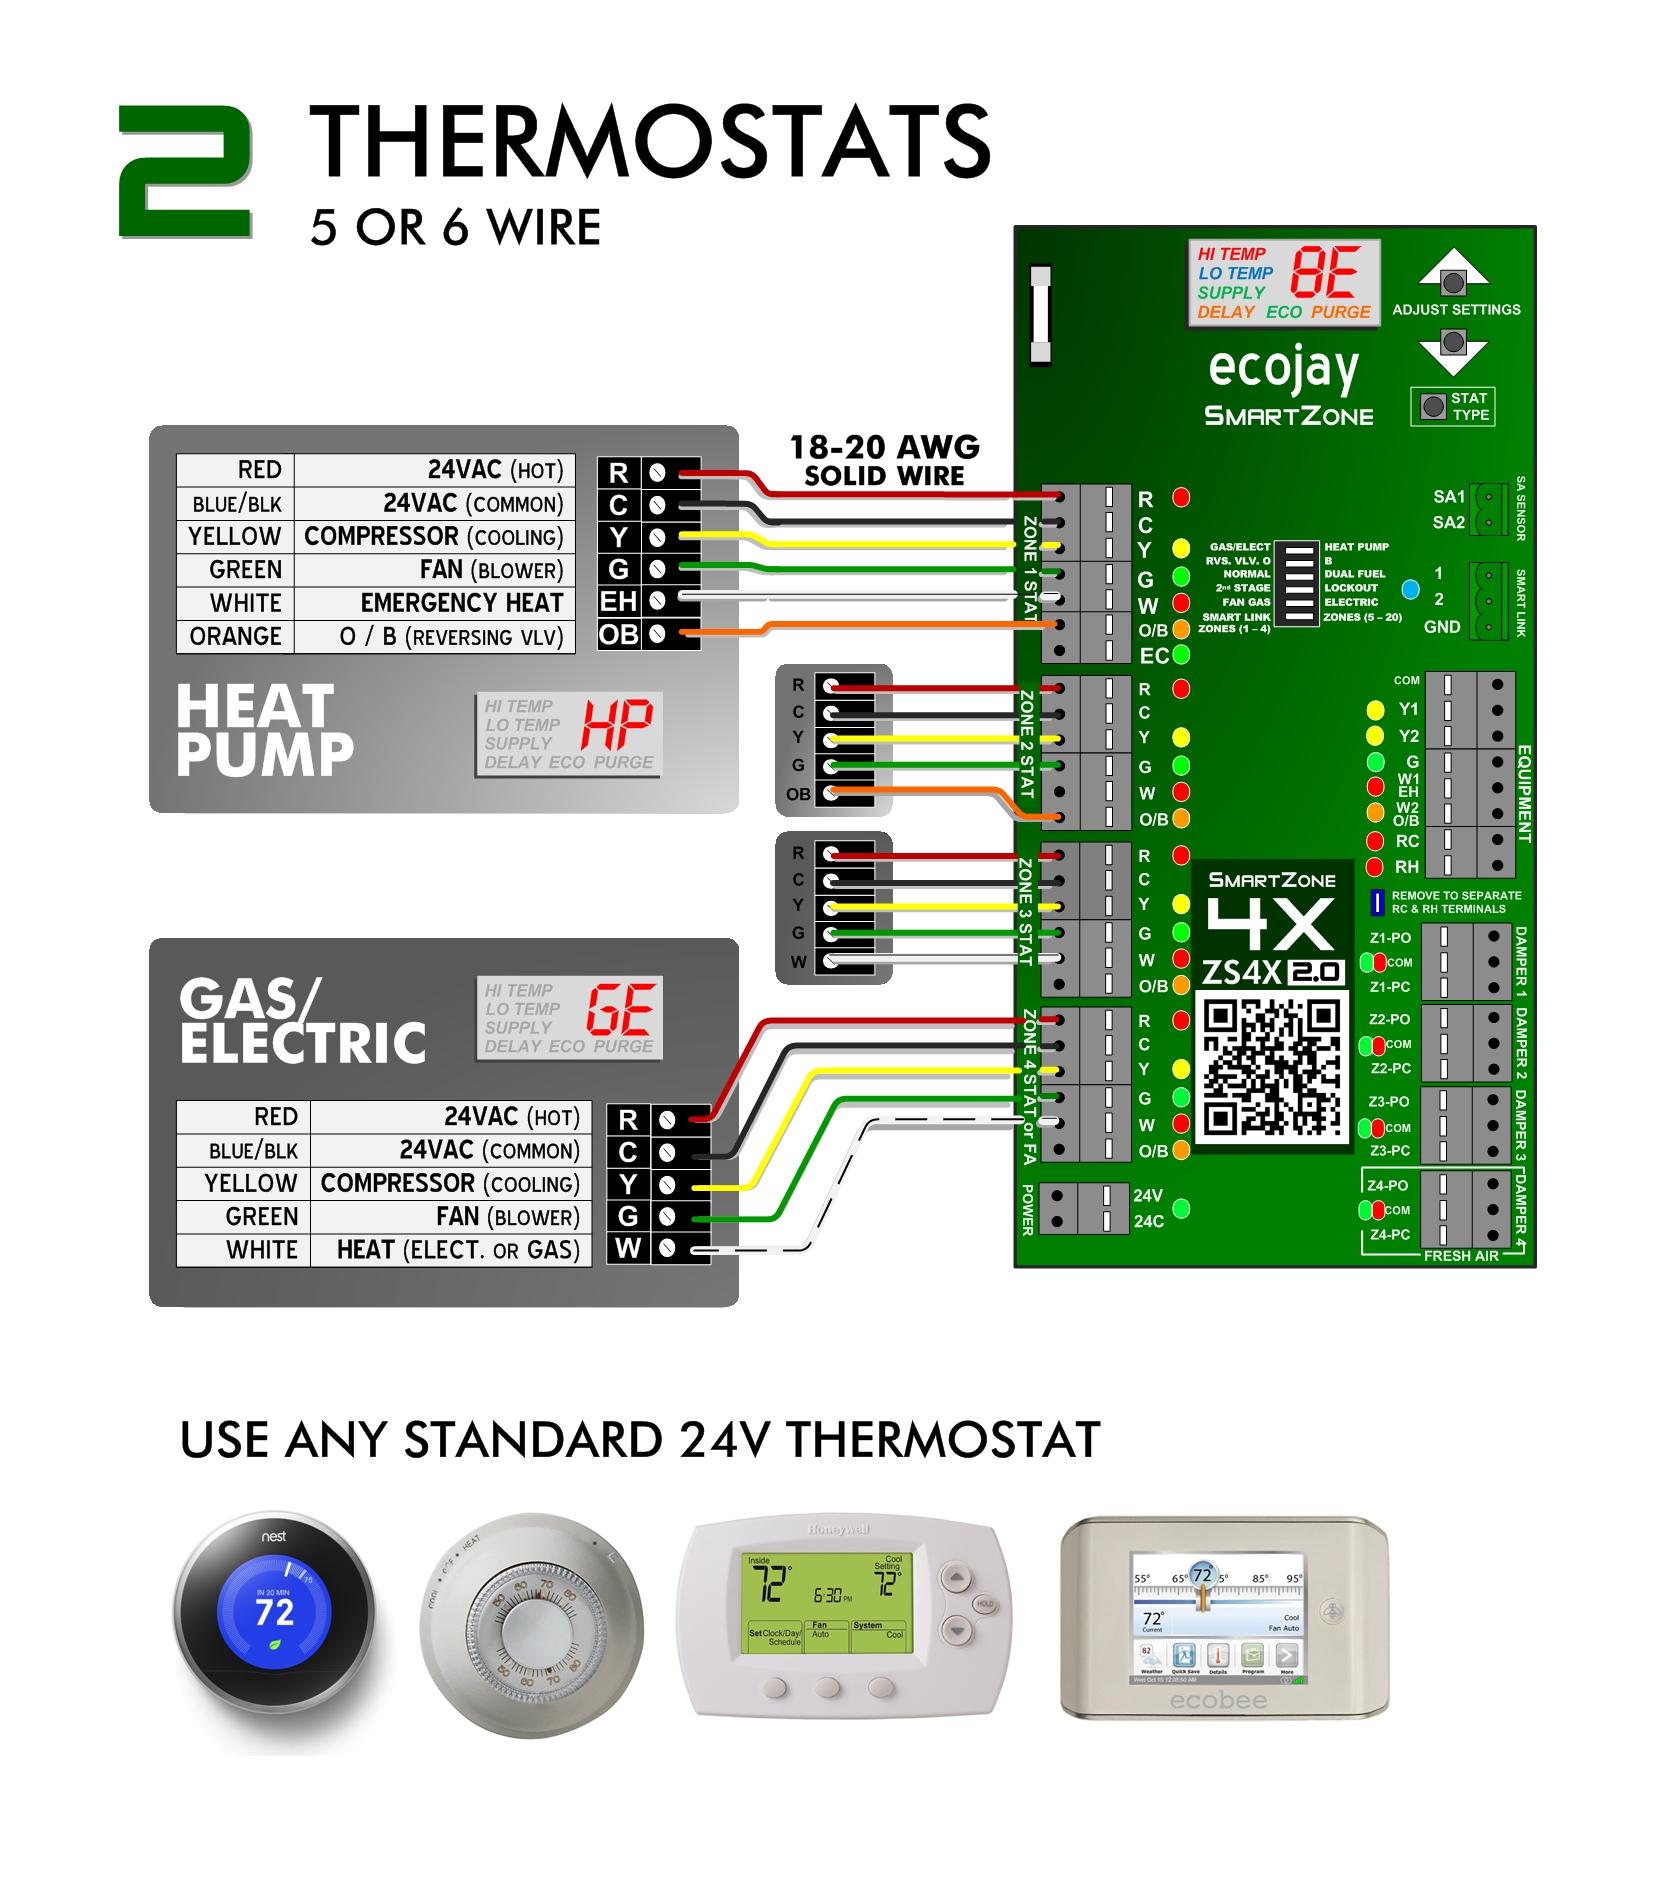 medium resolution of smartzone thermostat install